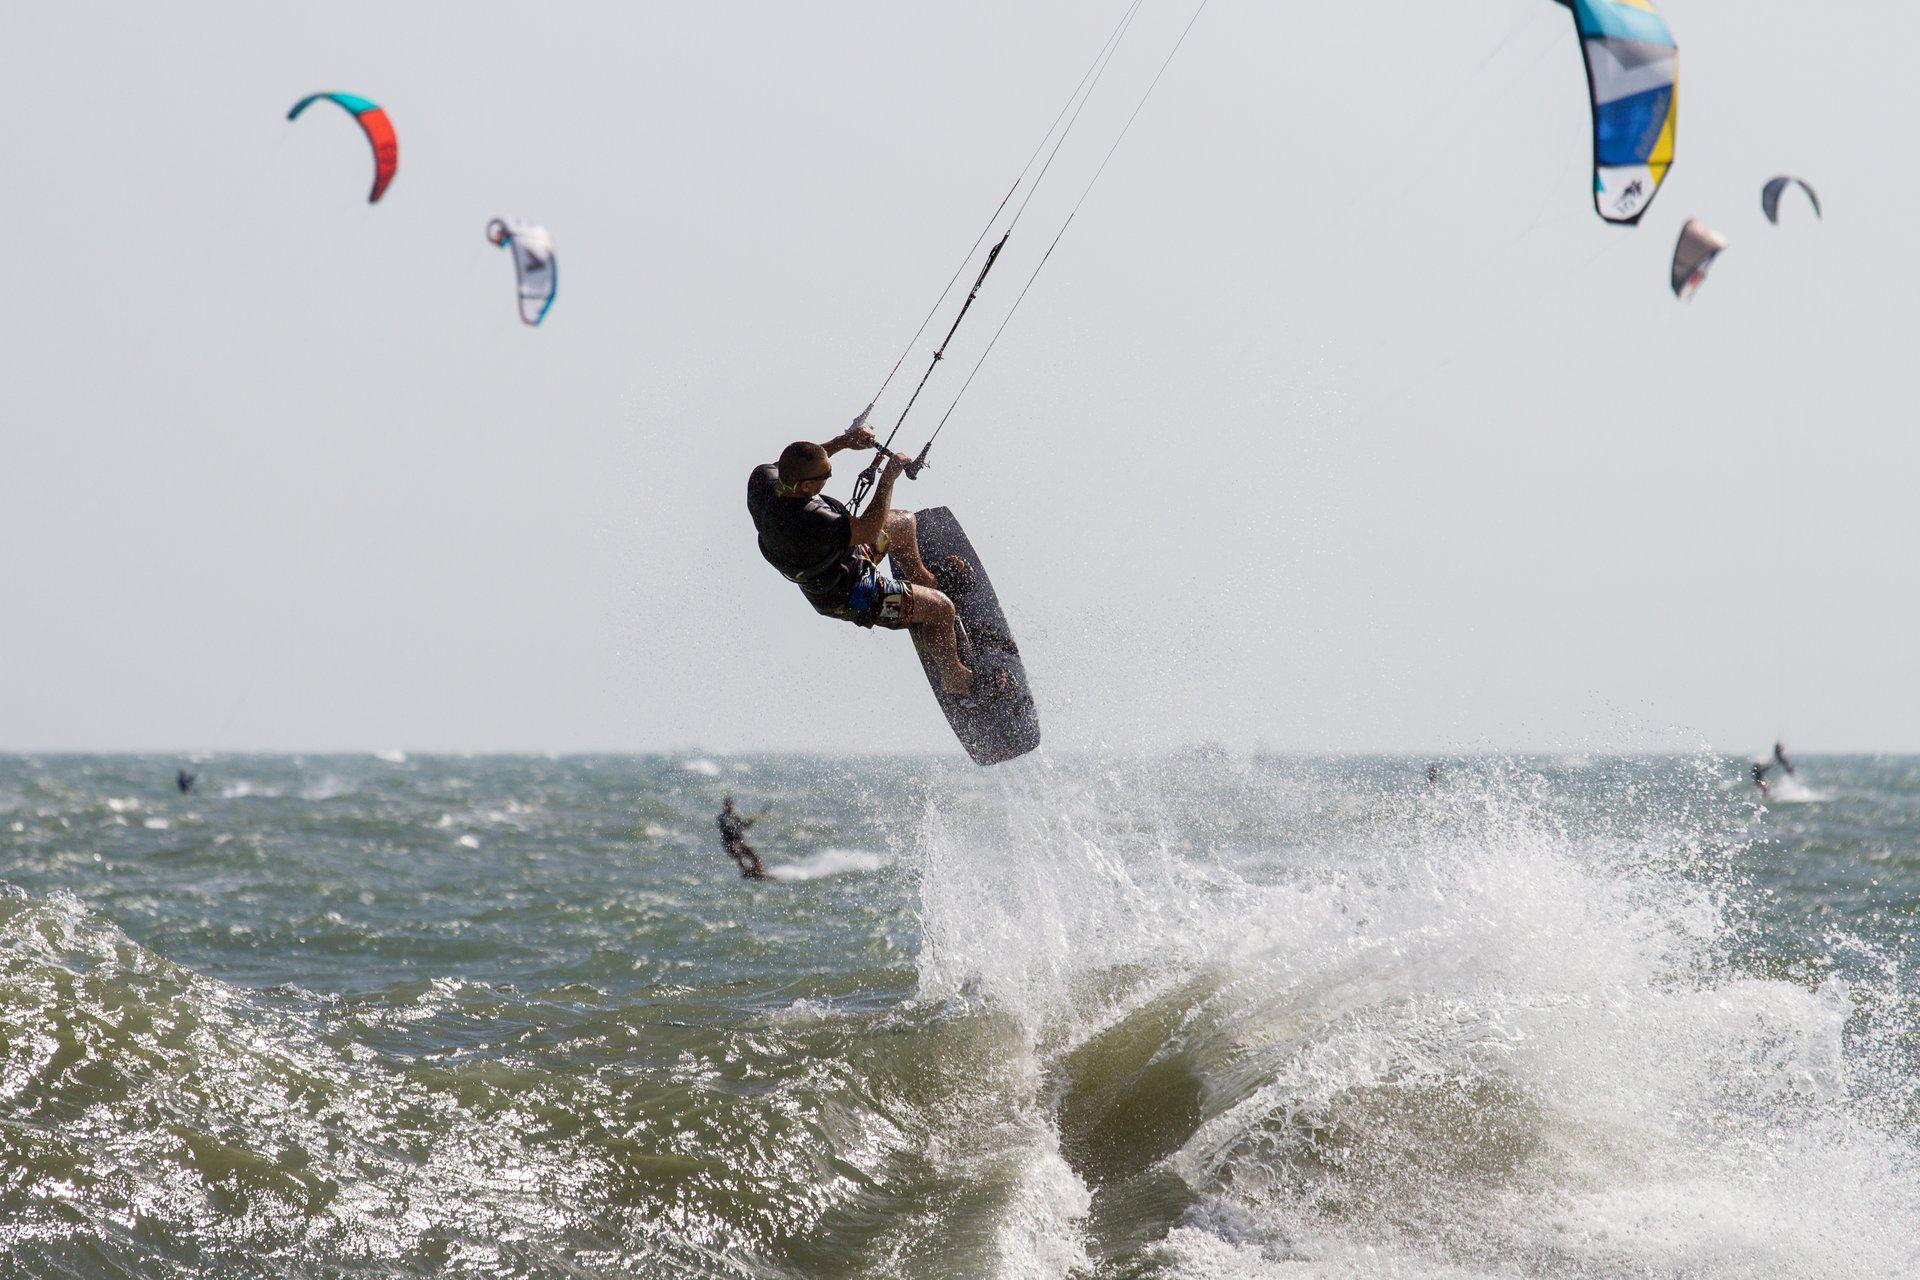 Kitesurfing and Windsurfing in Vietnam 2020 - Best Time